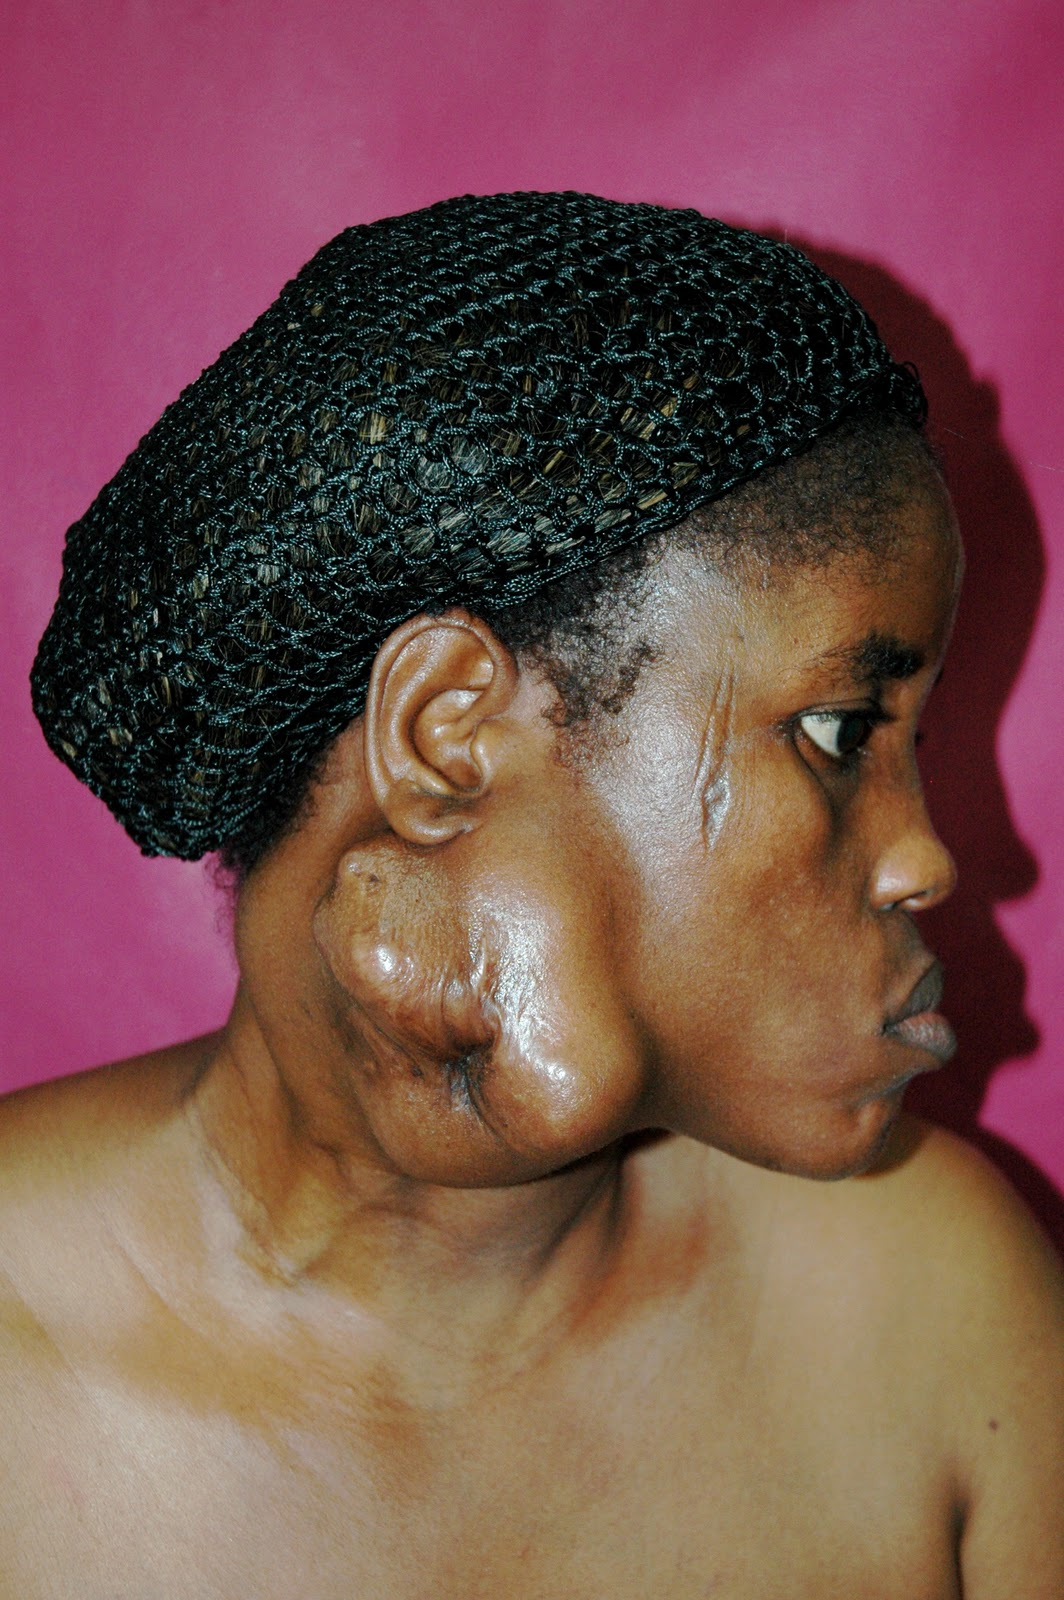 Adenoid Face...